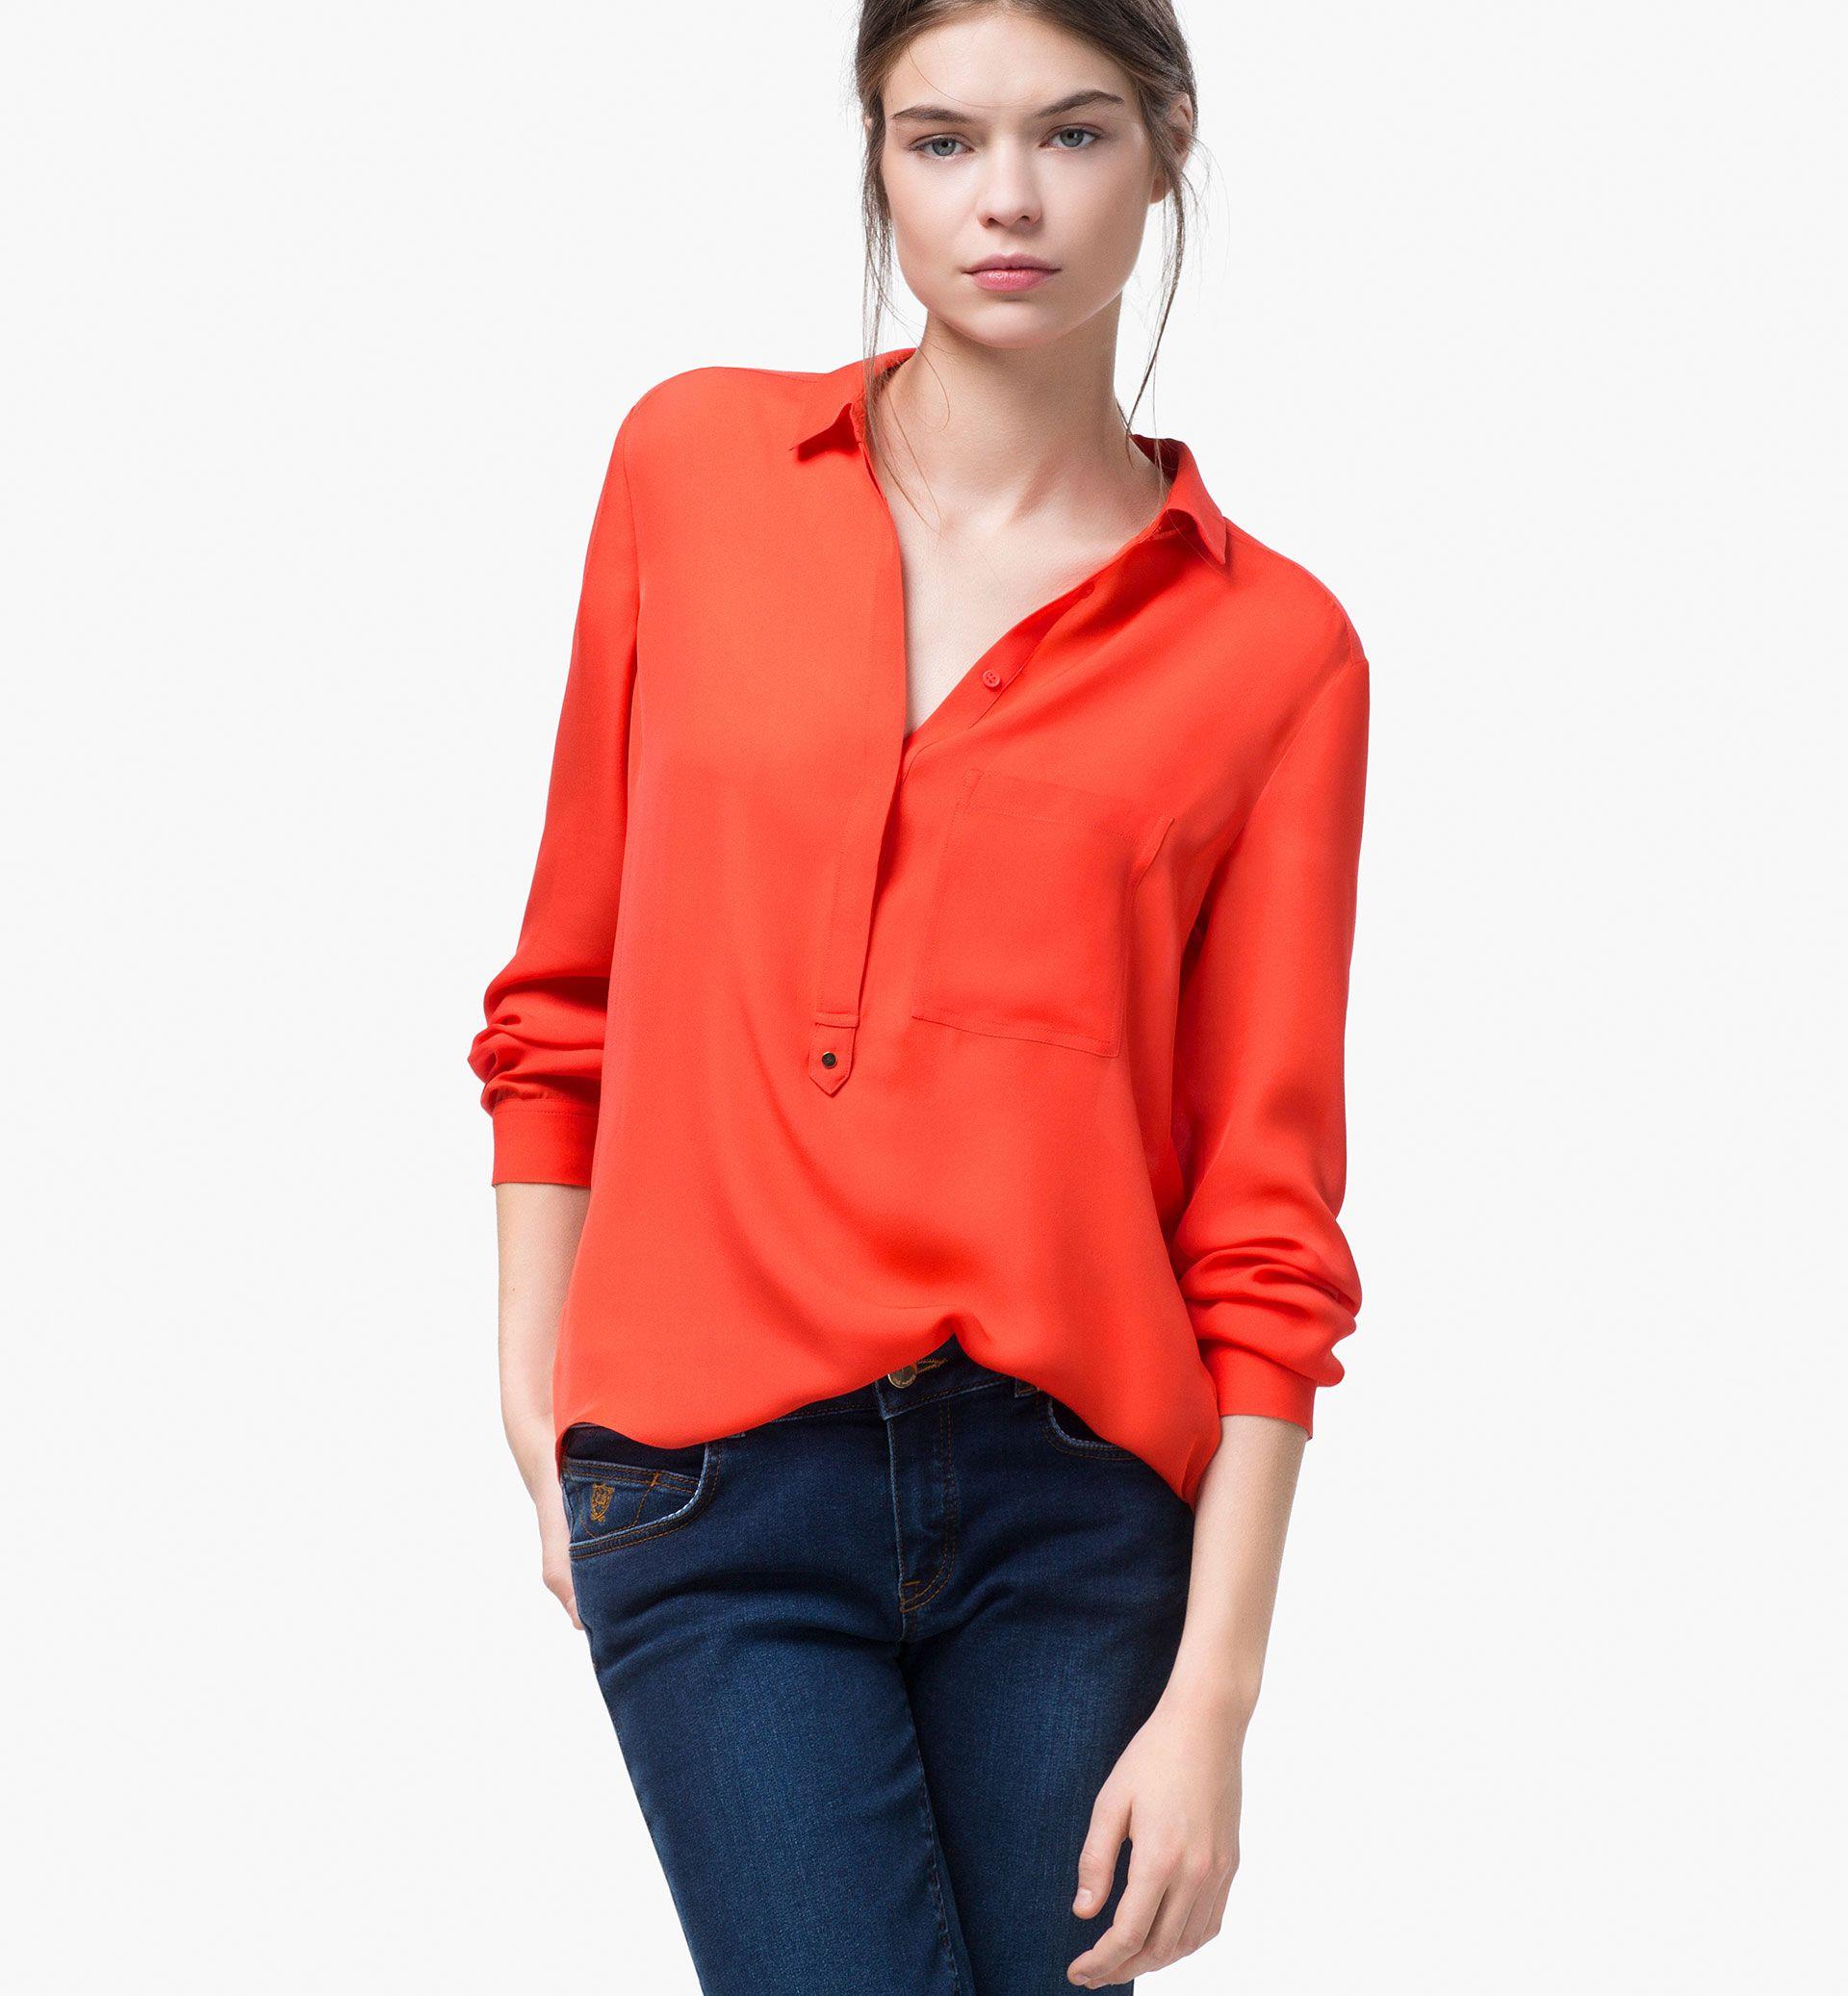 8c69046af2 SILK SHIRT - Shirts & Blouses - WOMEN - Qatar - Massimo Dutti ...